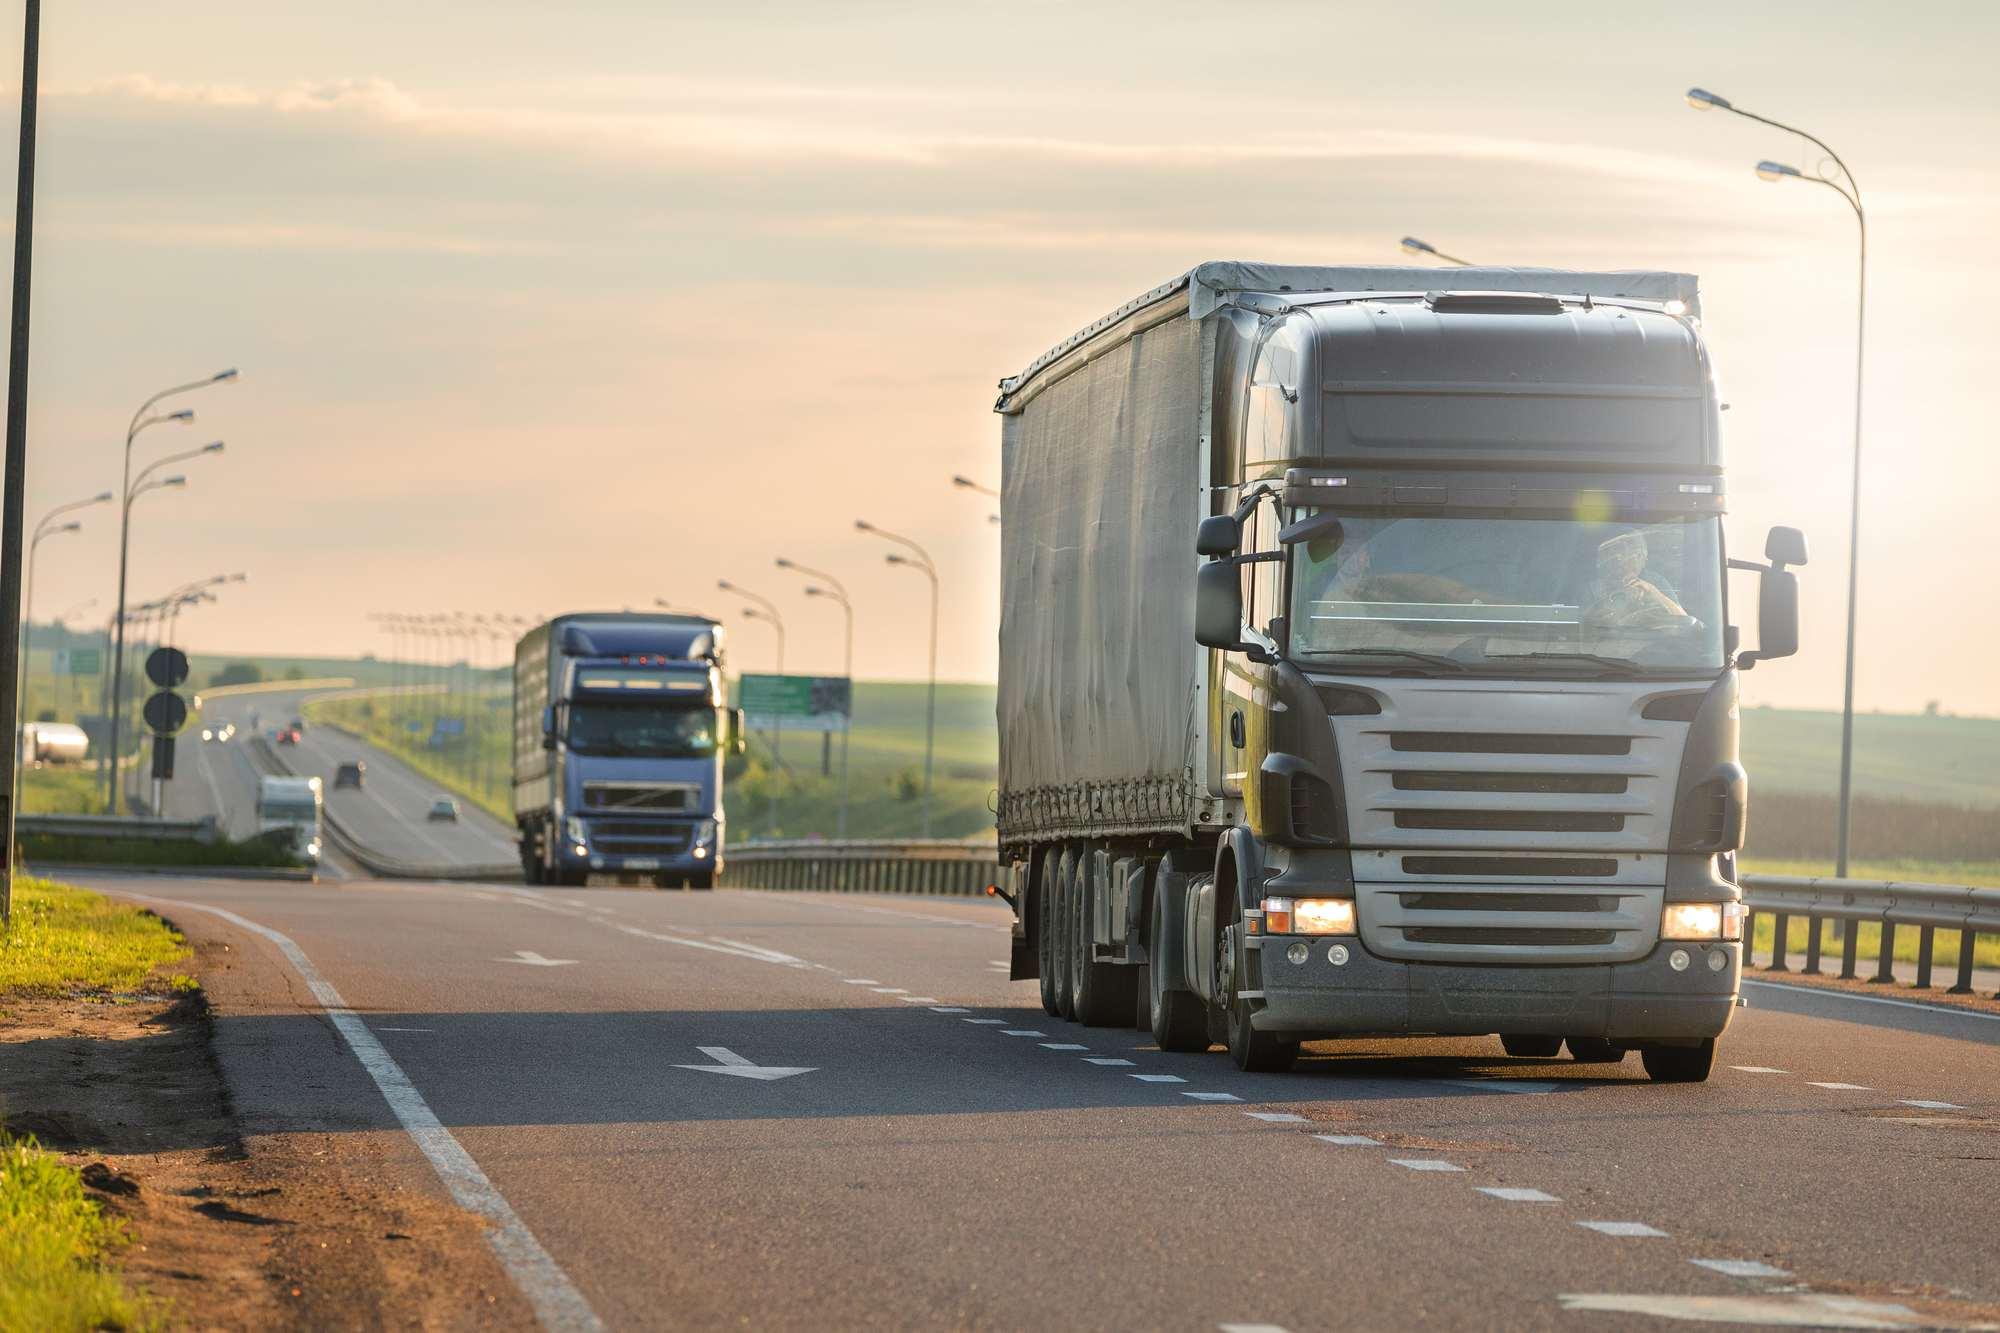 риски при транспортировке грузов